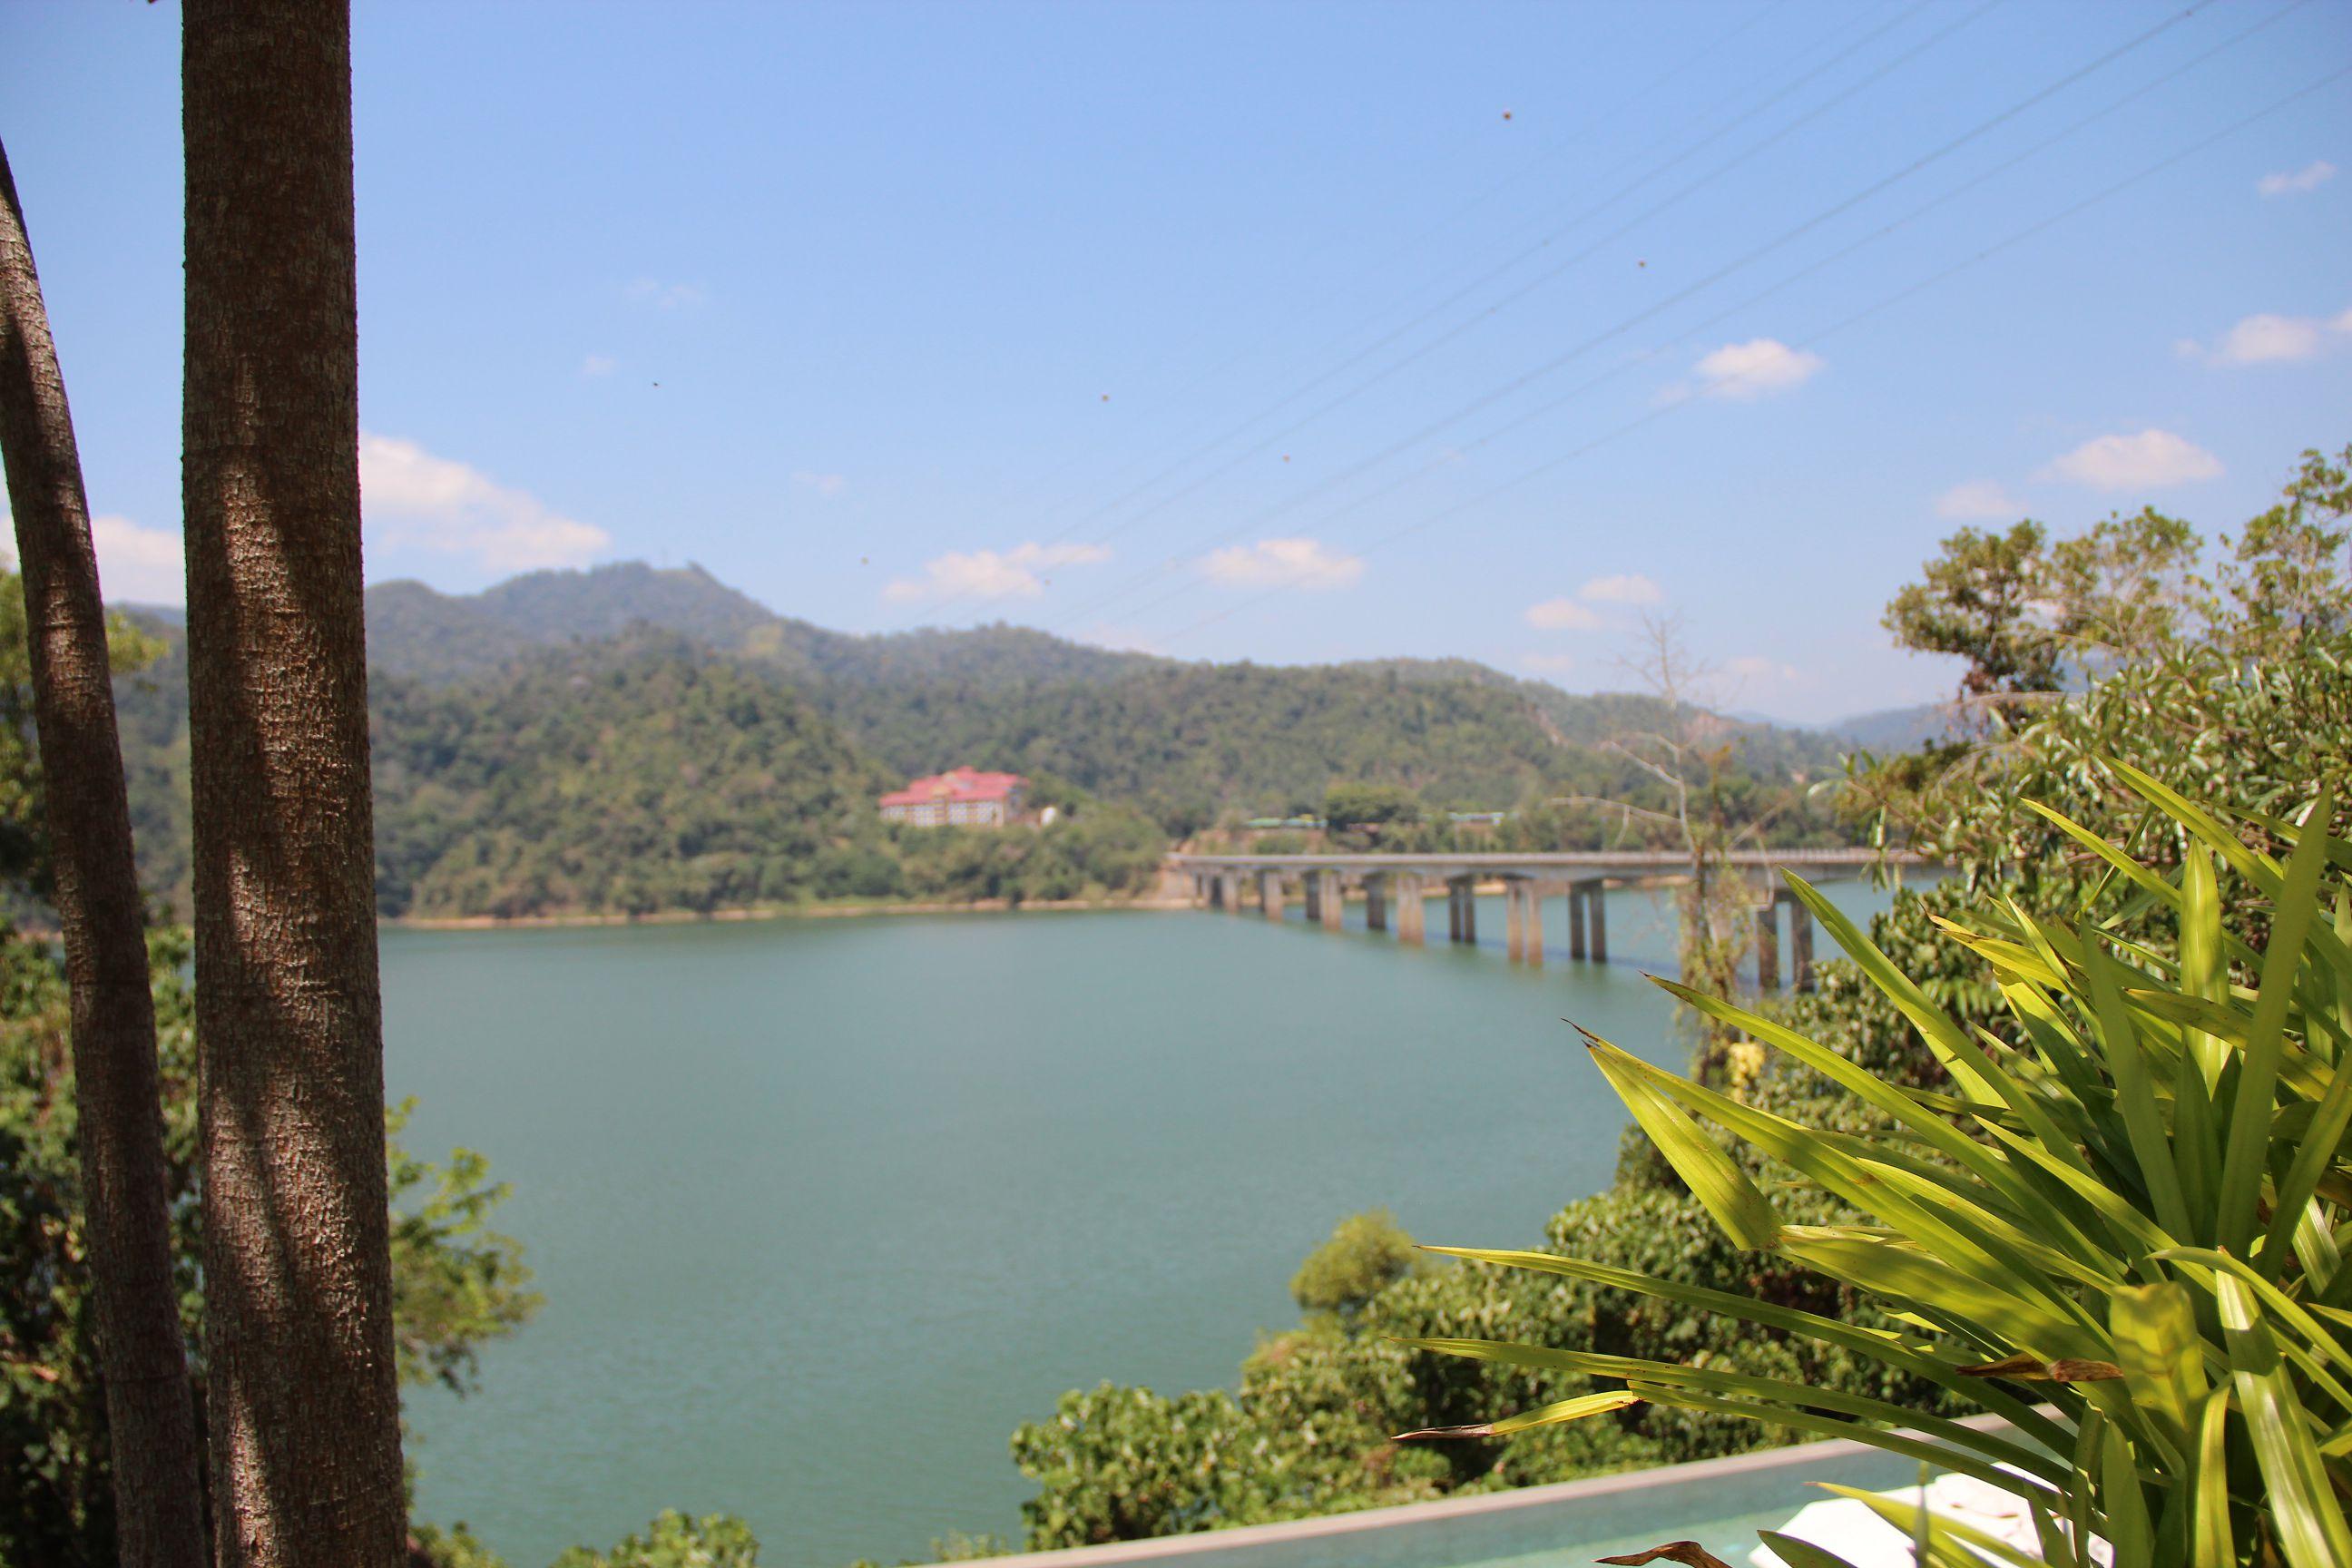 Royal Belum rainforest resort